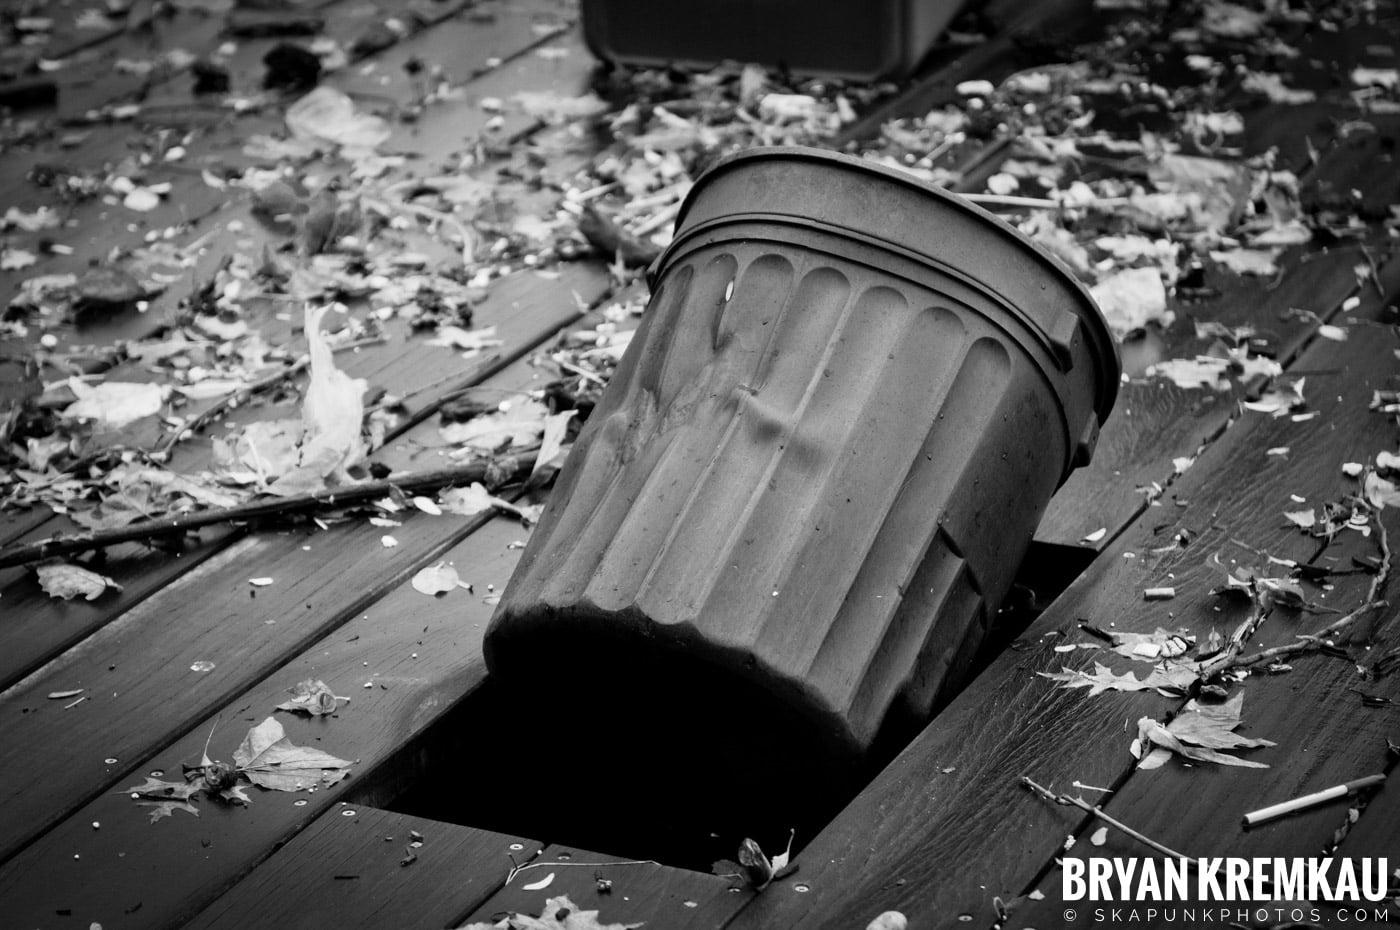 Hurricane Sandy 2012 @ Paulus Hook, Jersey City - 10.29.12 - 10.30.12 (6)